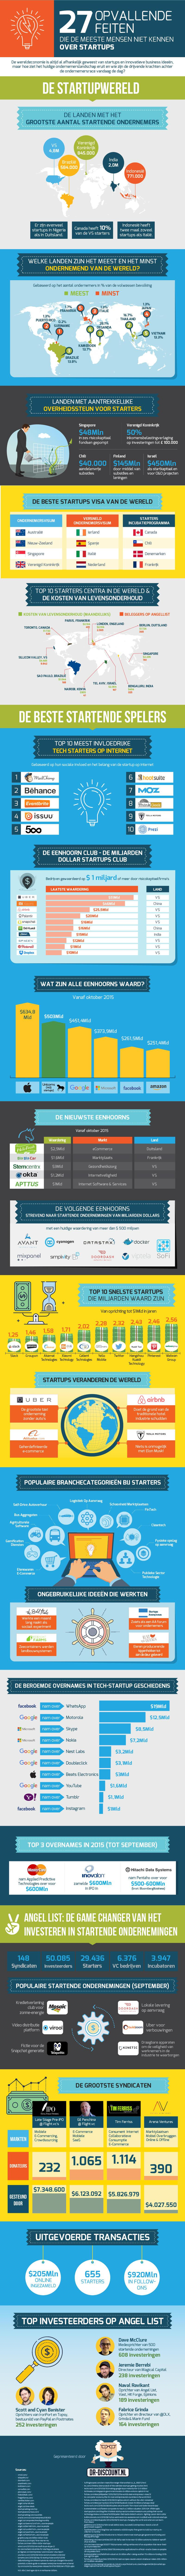 Infographic_Startups_Dutch